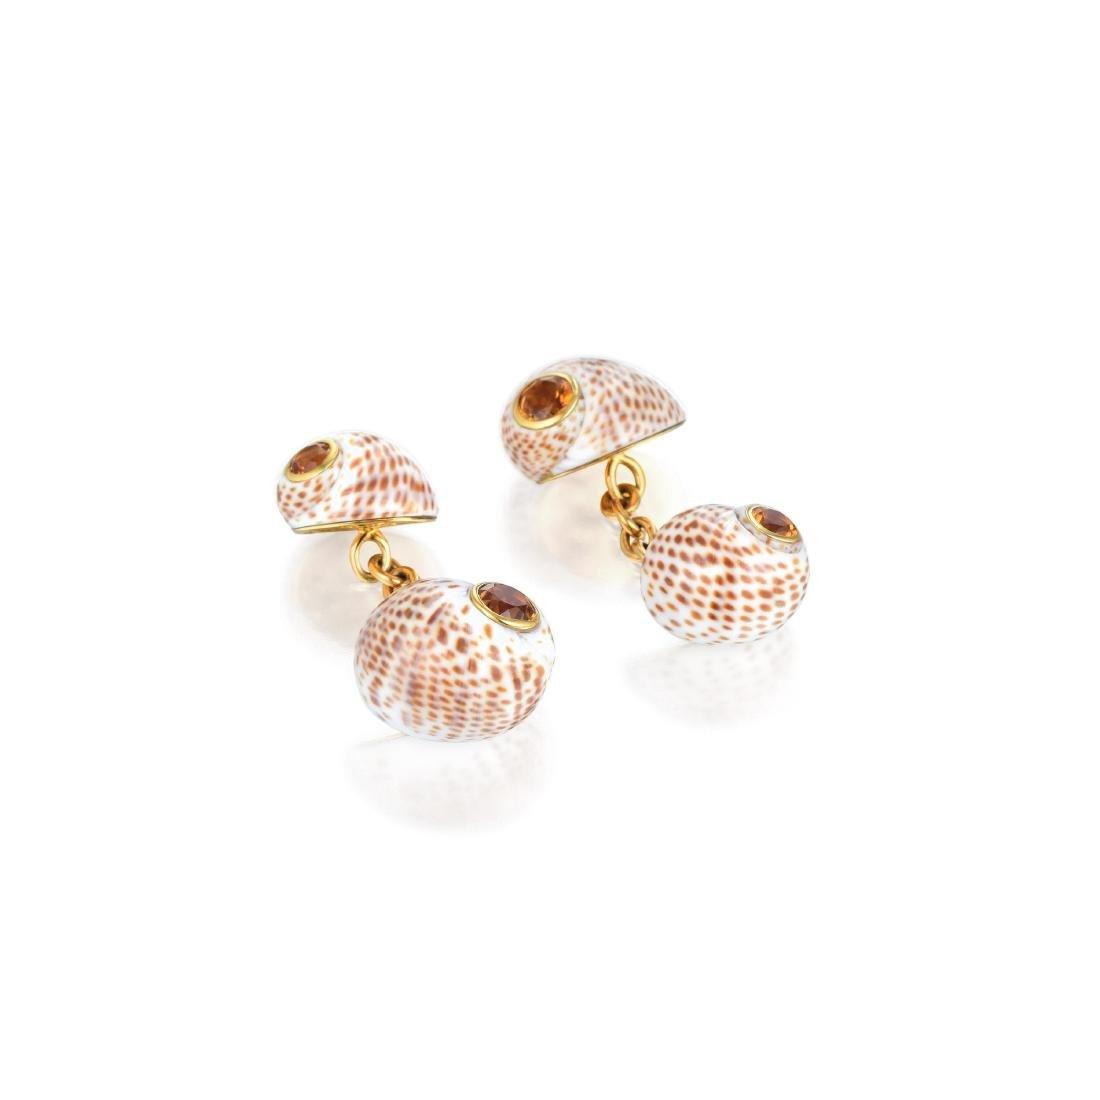 Trianon Seashell and Citrine Cufflinks